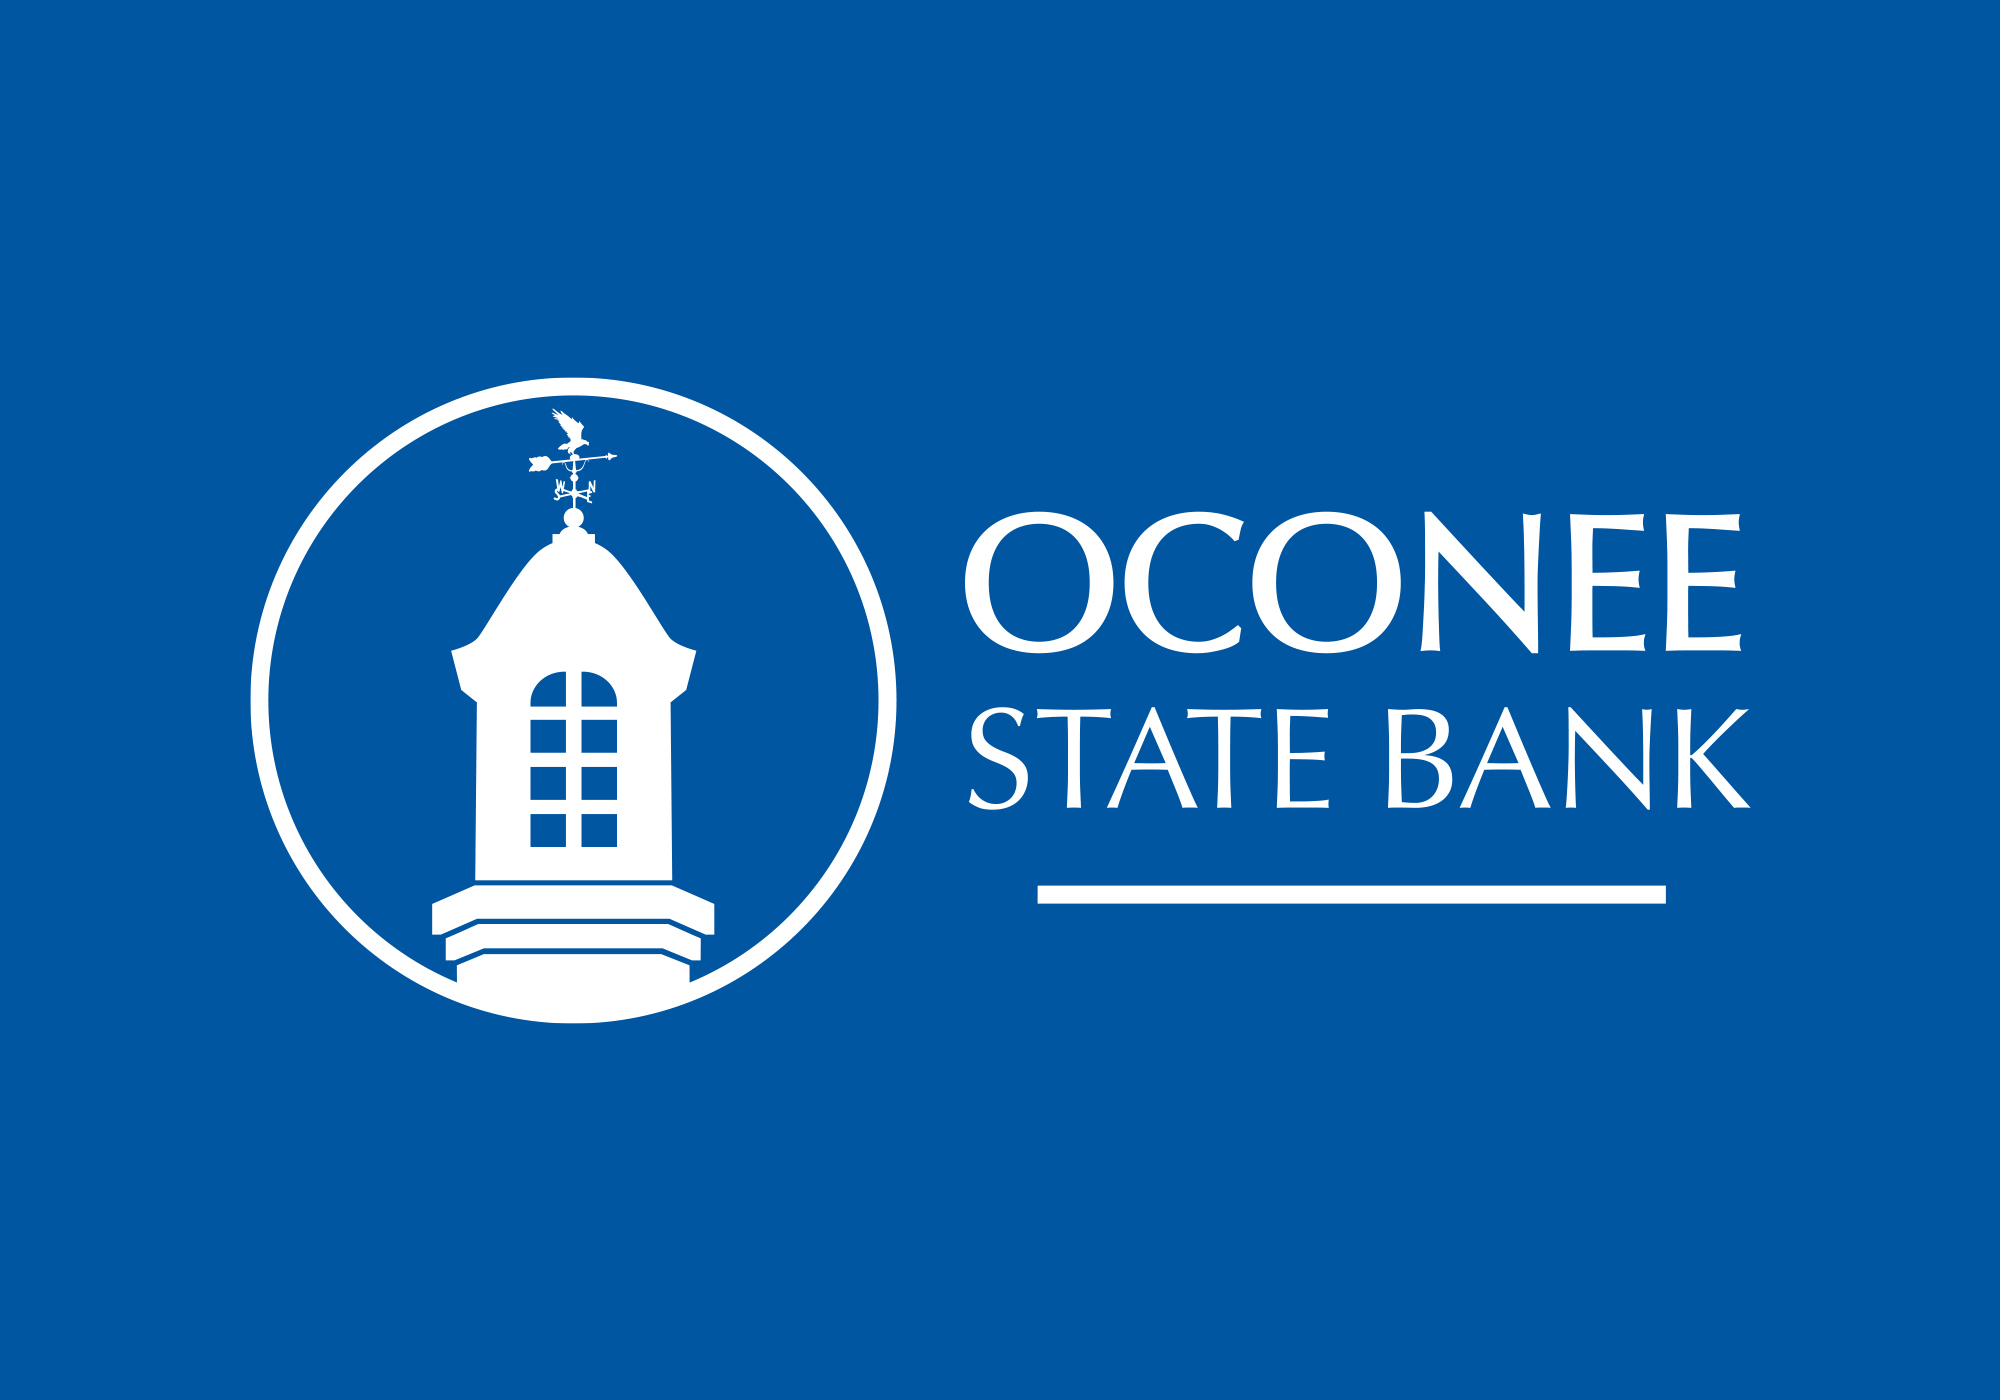 Home › Oconee State Bank